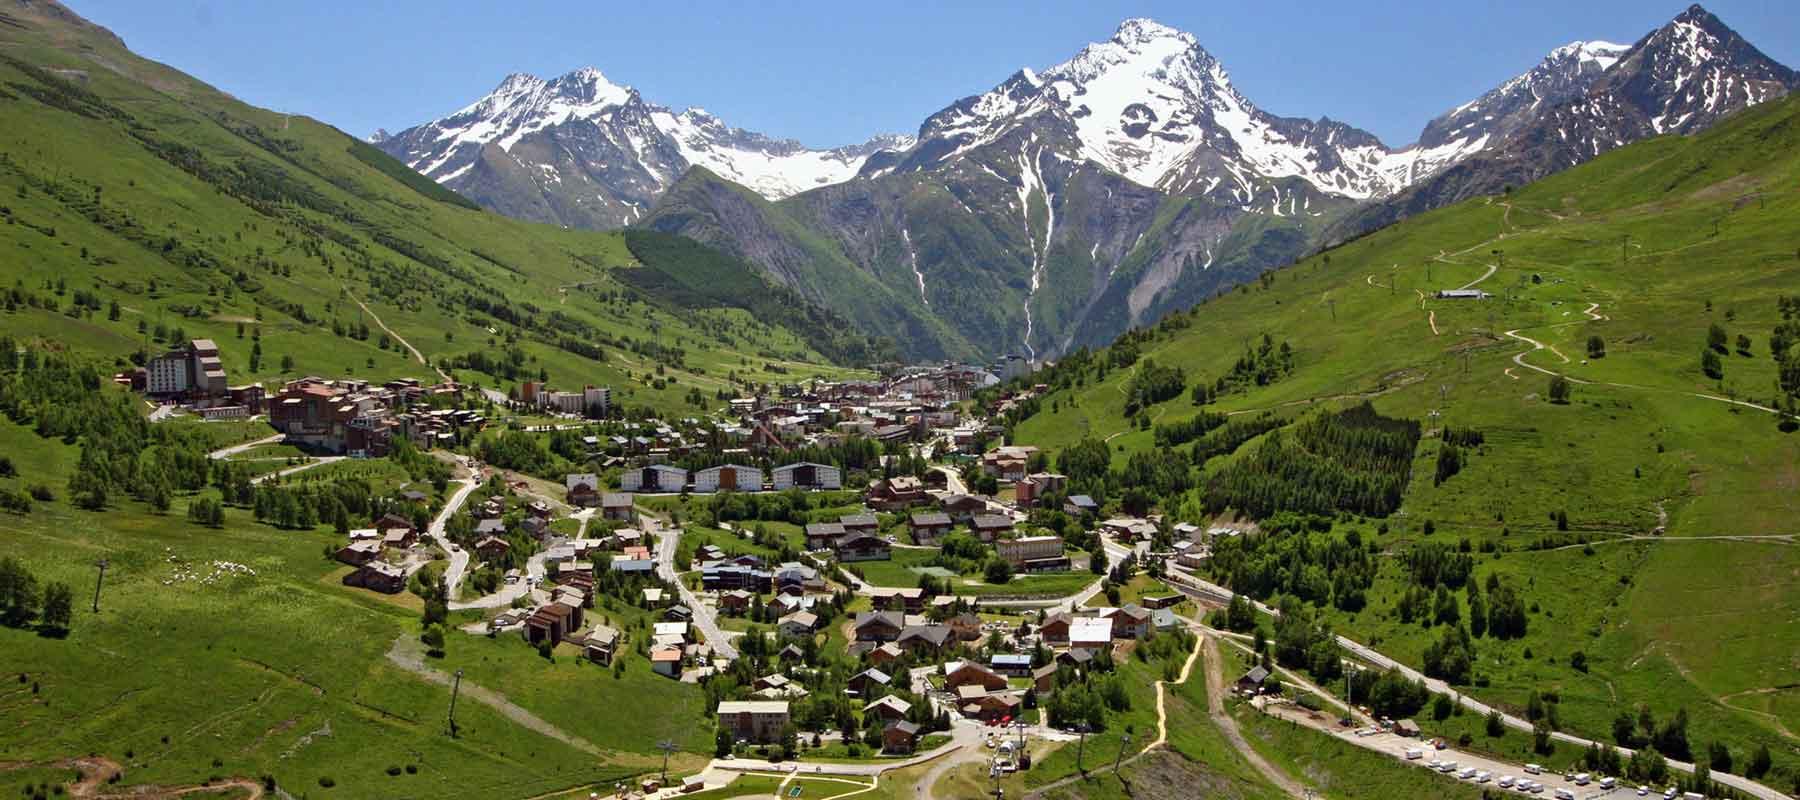 MoreStyleChalet - Les 2 Alpes - Attivita